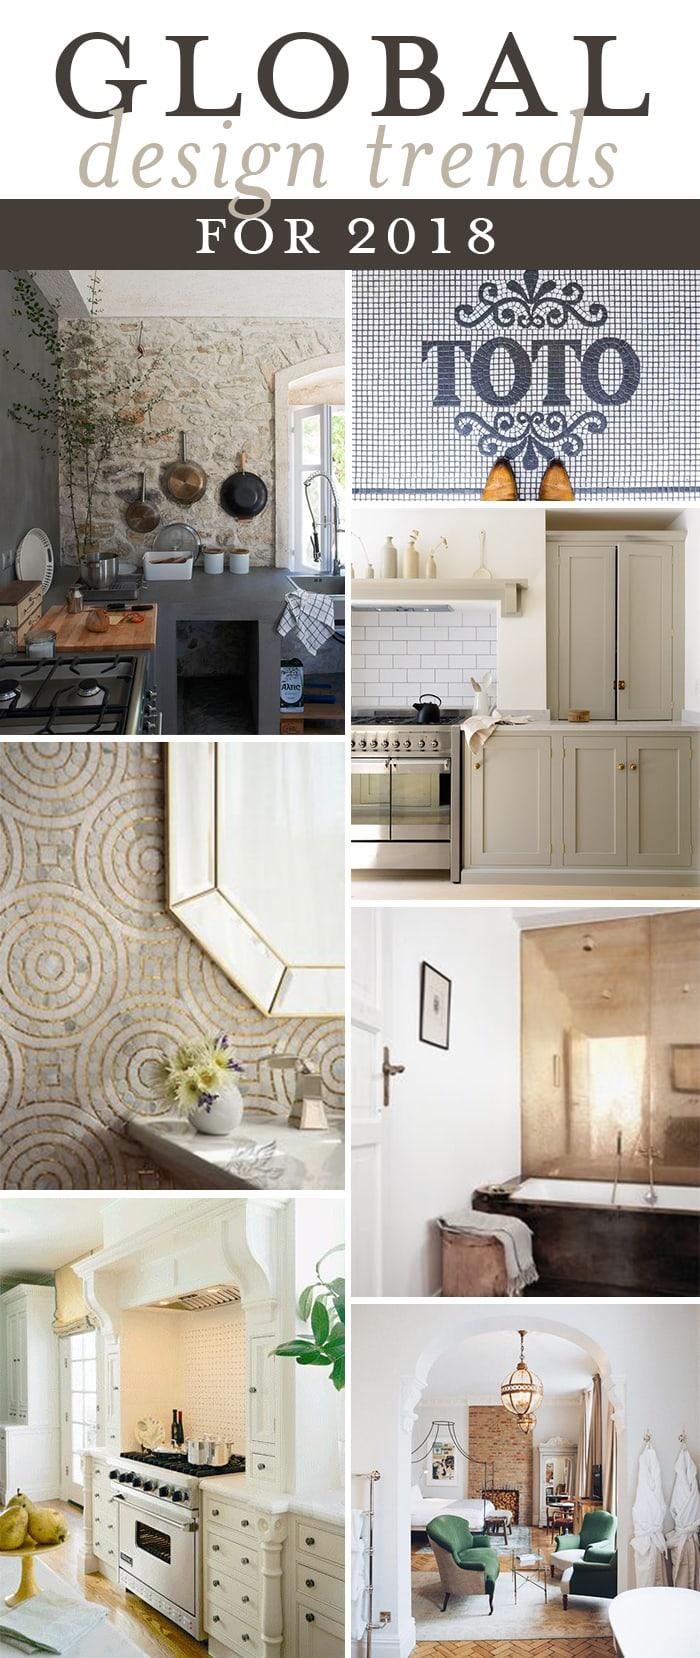 Astounding My Top 10 Design Trends For 2018 Jenna Sue Design Blog Home Interior And Landscaping Ologienasavecom